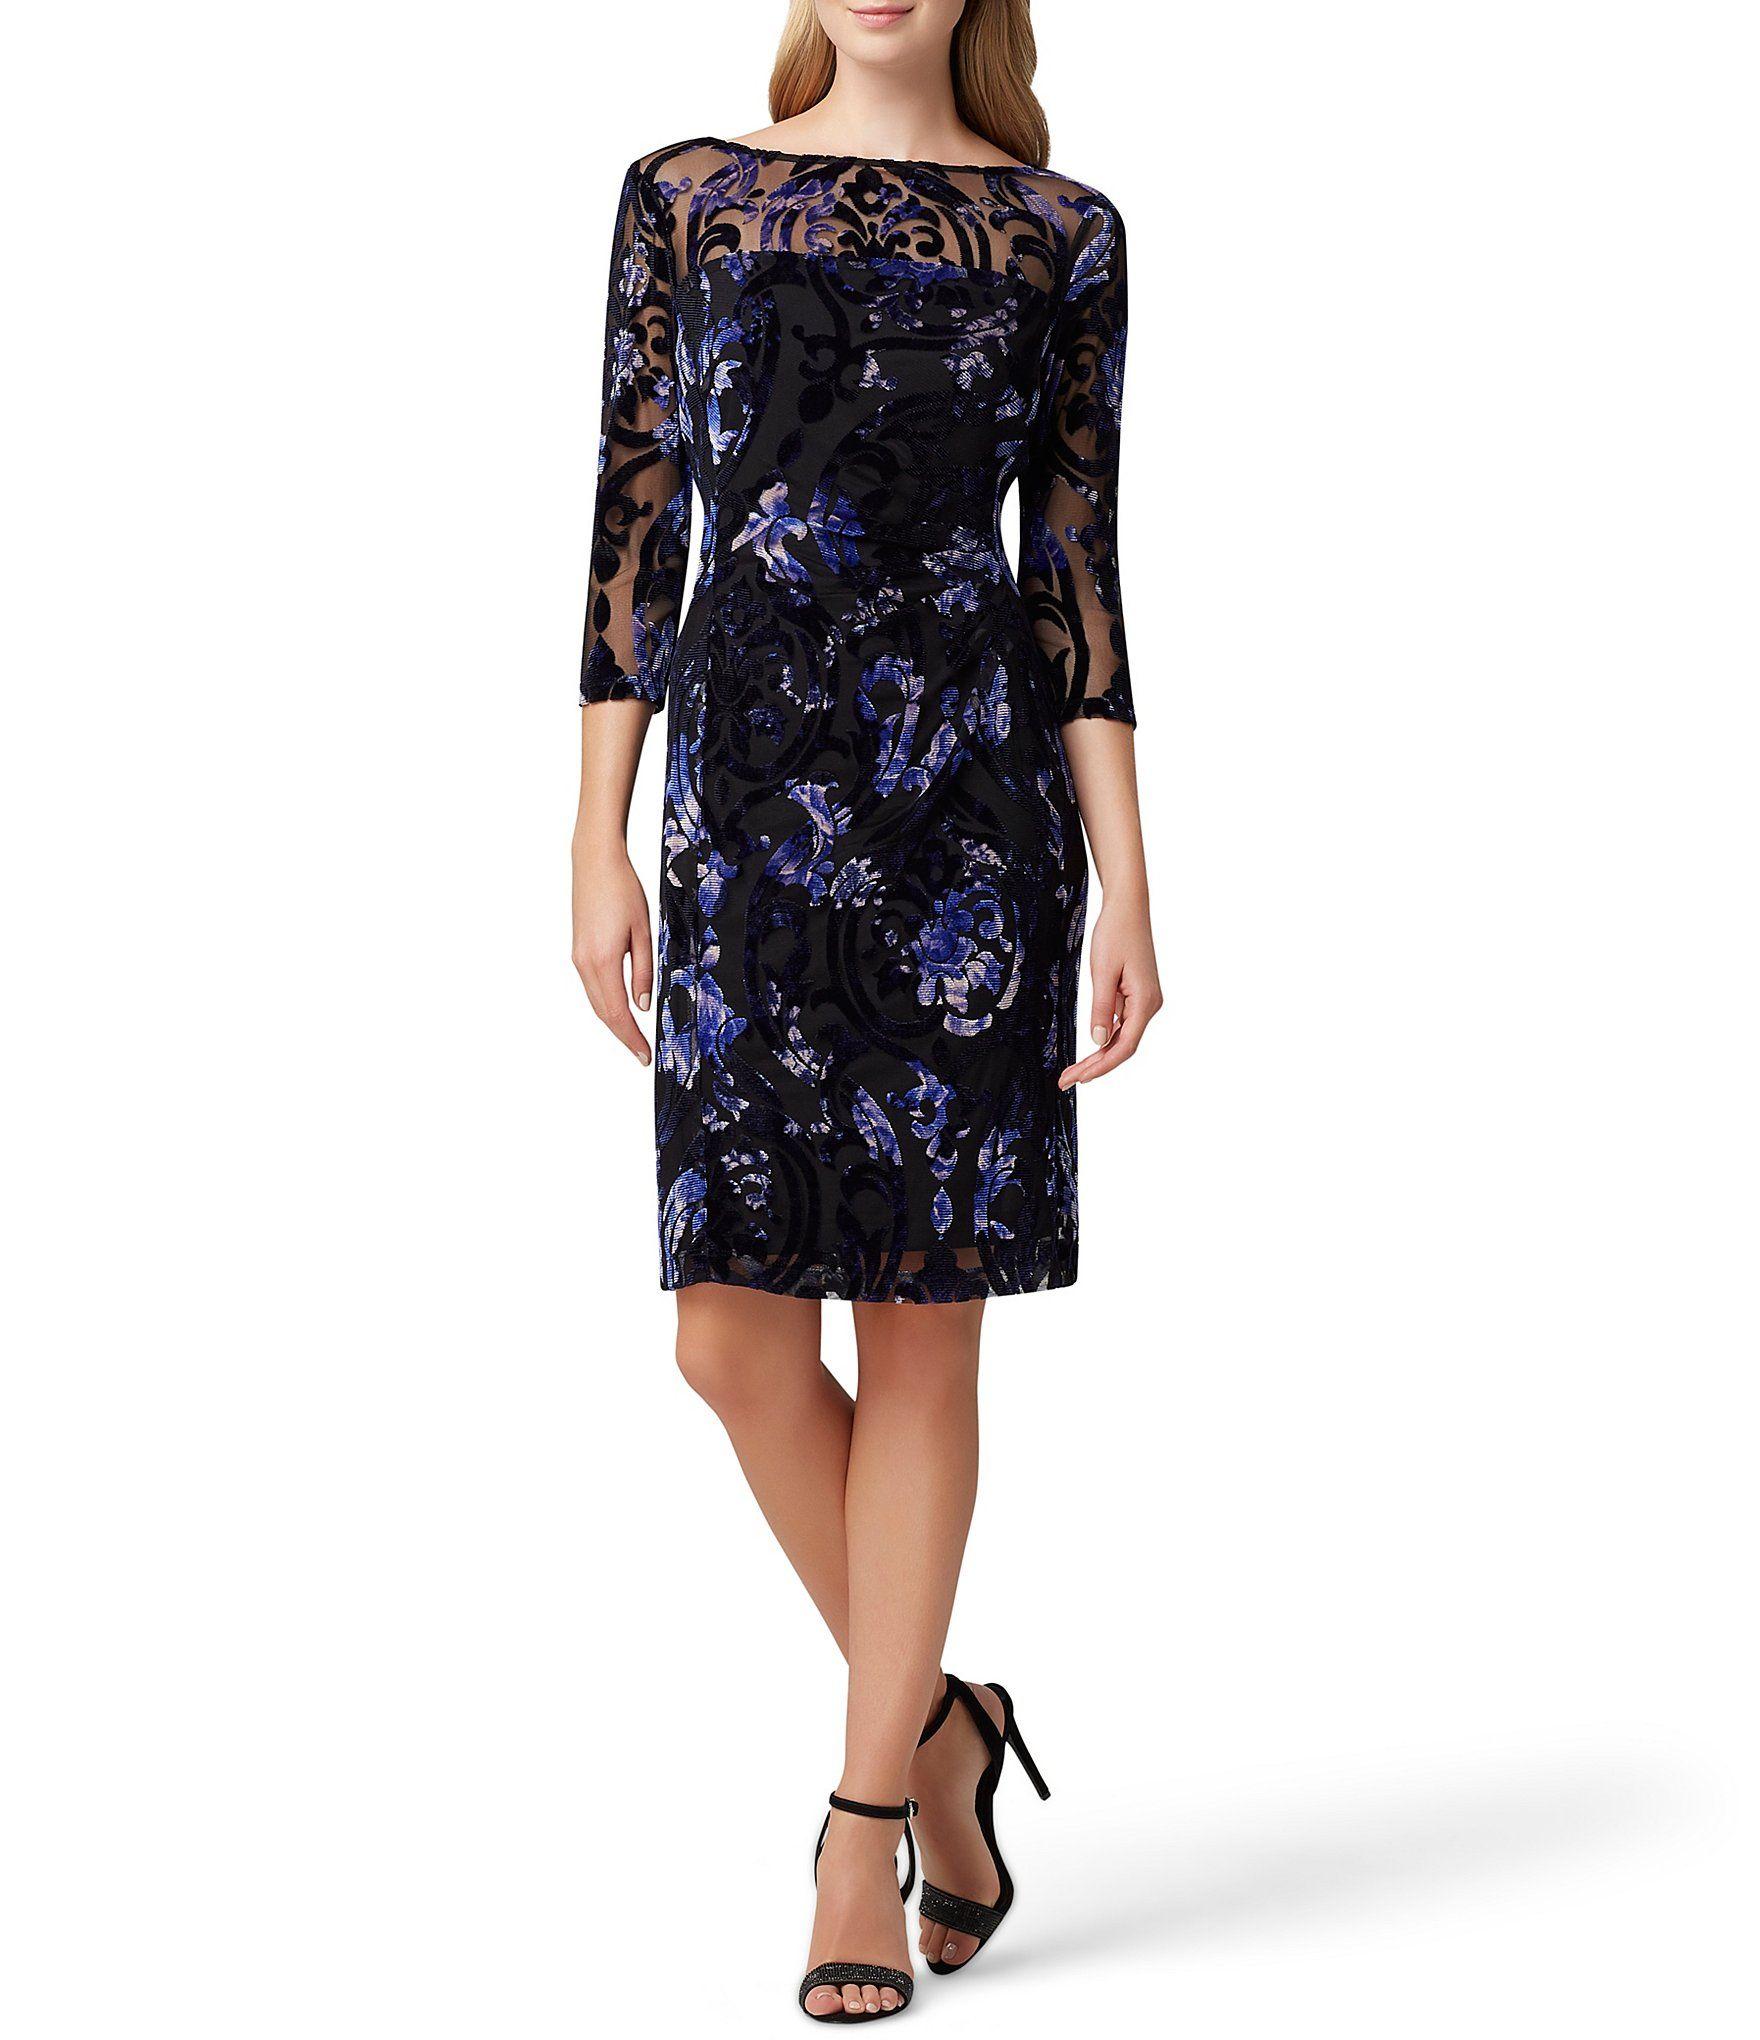 Tahari ASL Floral Print Velvet Burnout Sheath Dress – Black/Purple Burnout 6